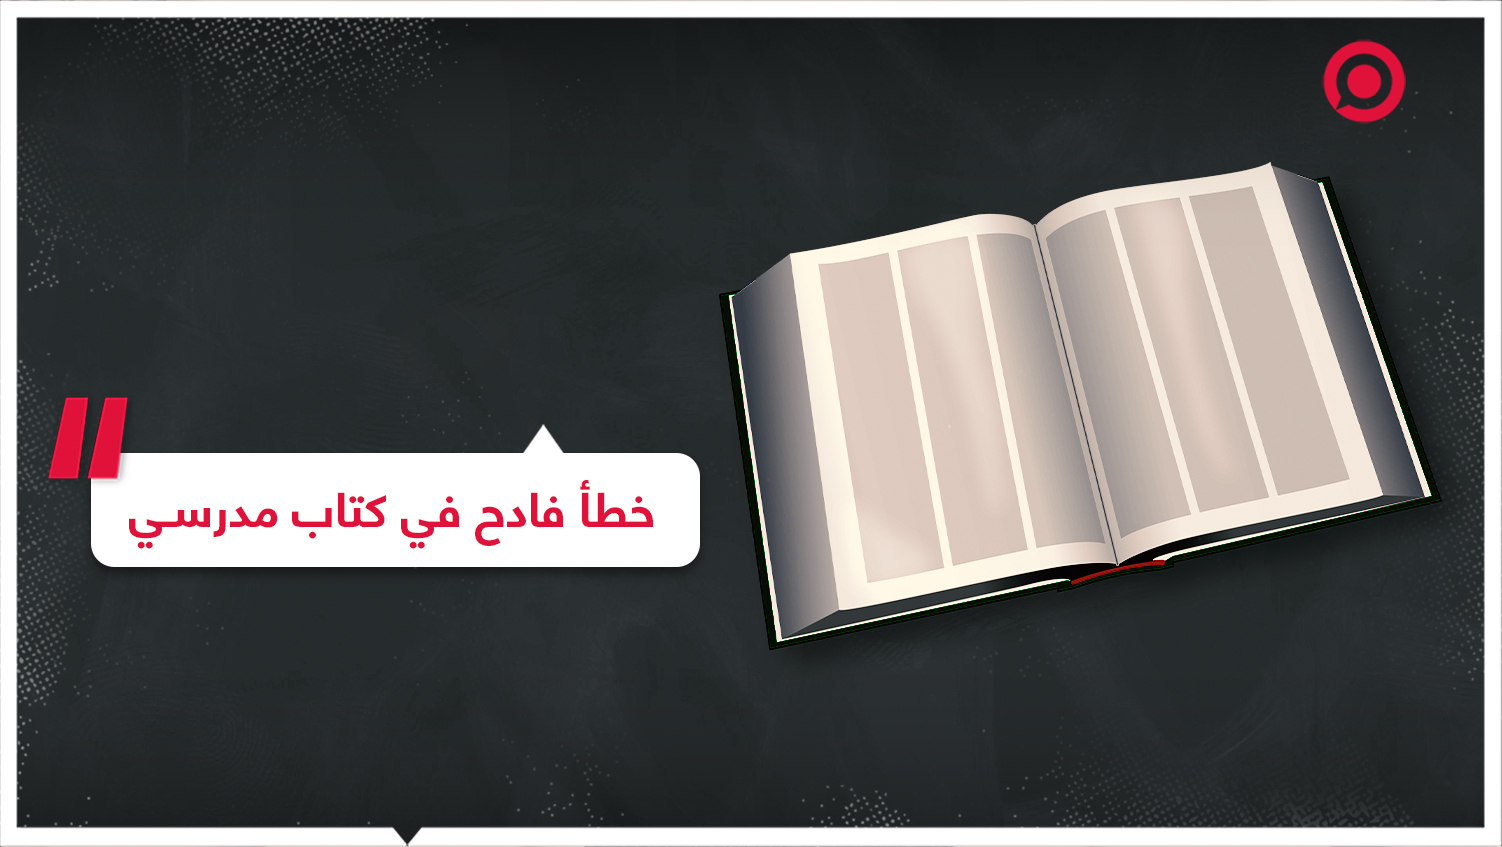 #مصر #أحمد_شوقي